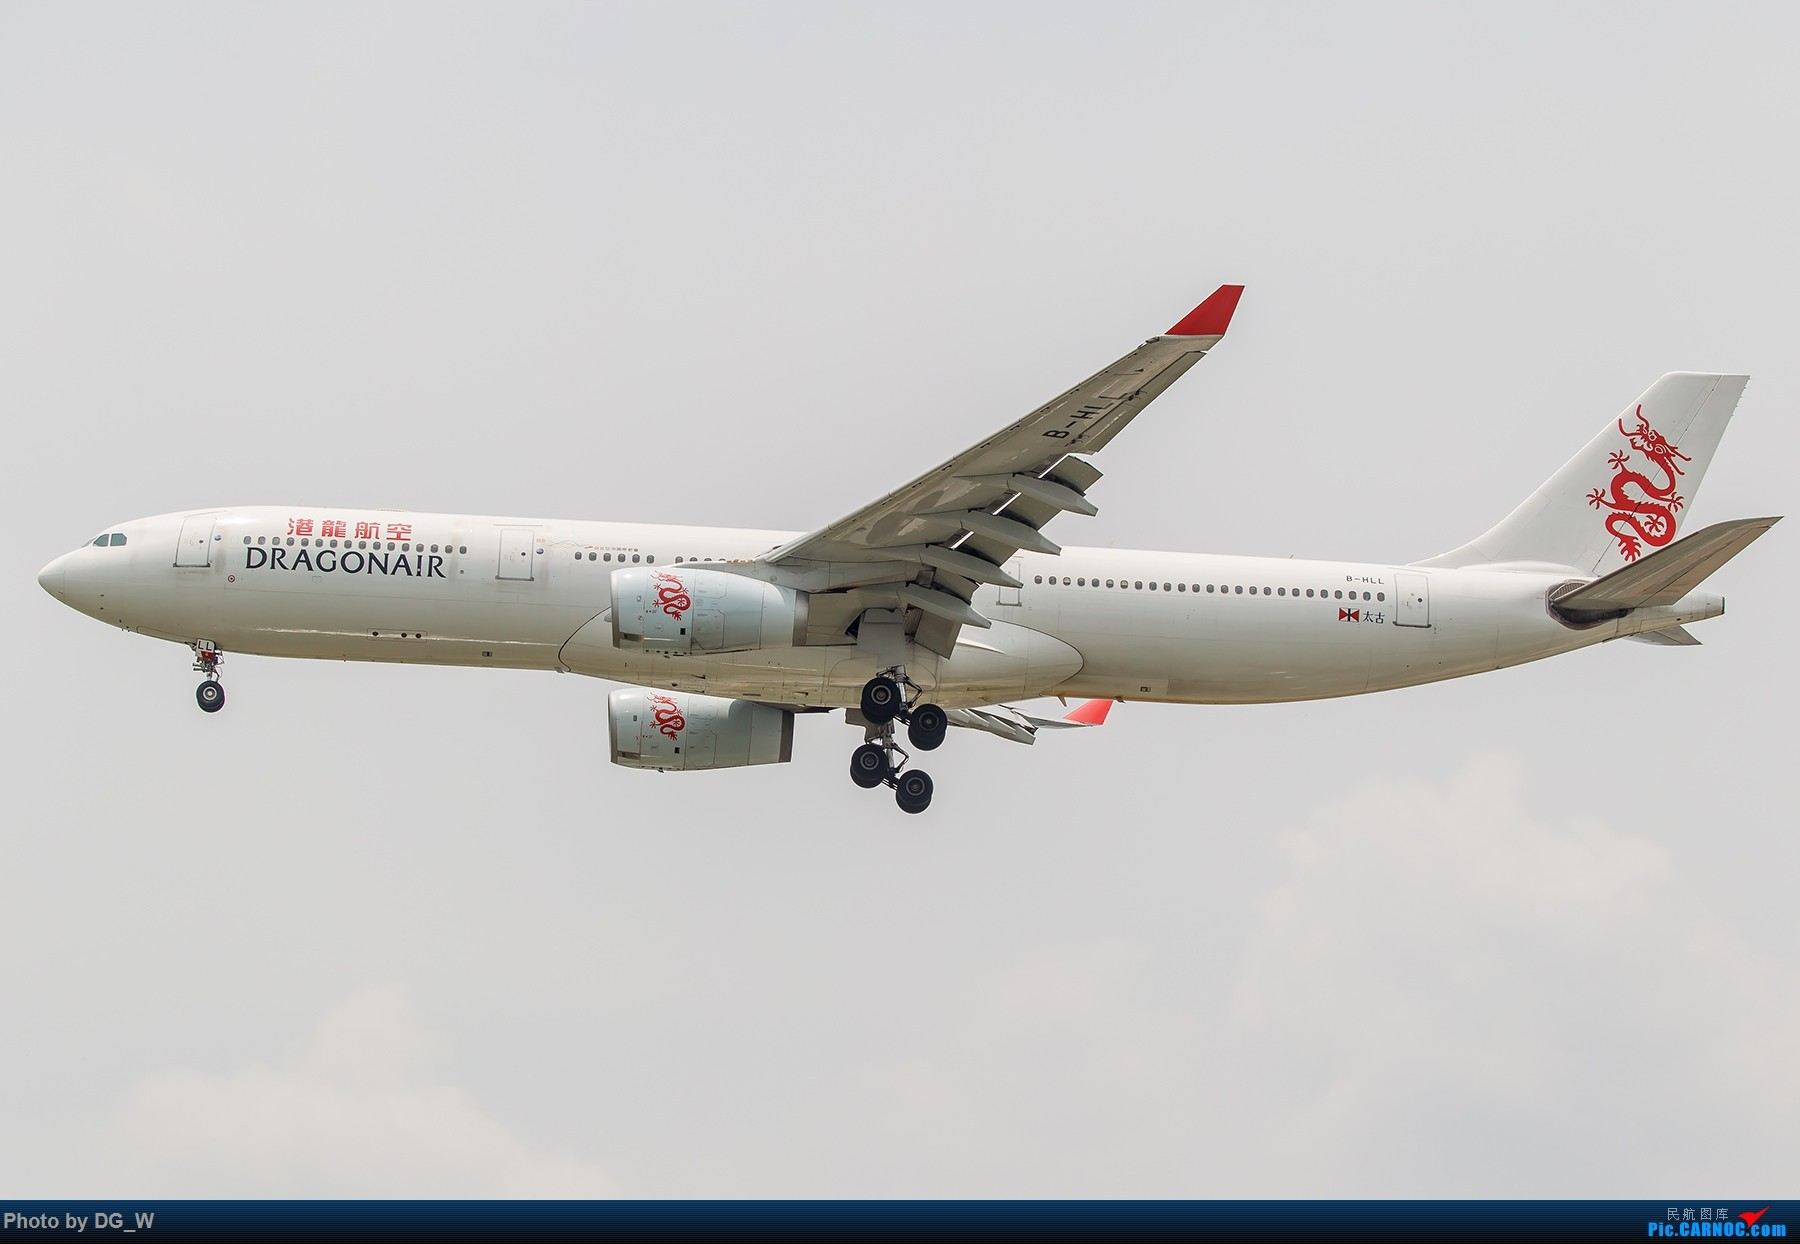 Re:[原创]【南宁飞友】两月之内三次虹桥拍机,大雨中的吹水,水泥天的迪斯尼,晚点的789,不期而遇的ARJ AIRBUS A330-300 B-HLL 中国上海虹桥国际机场